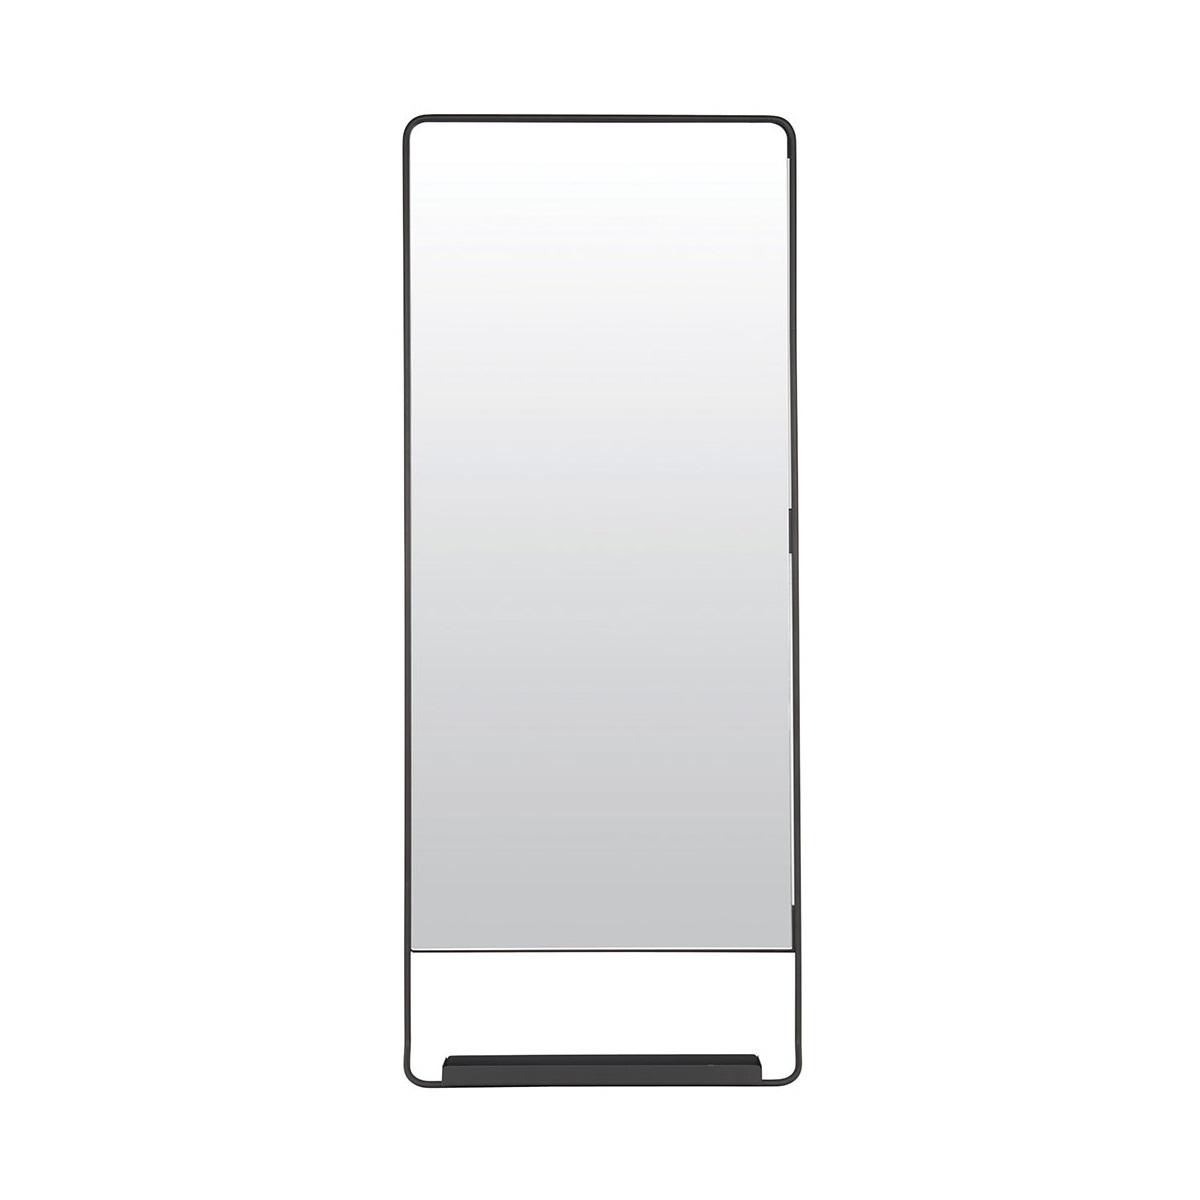 Spegel CHIC m hylla 45 x 110 cm, House Doctor